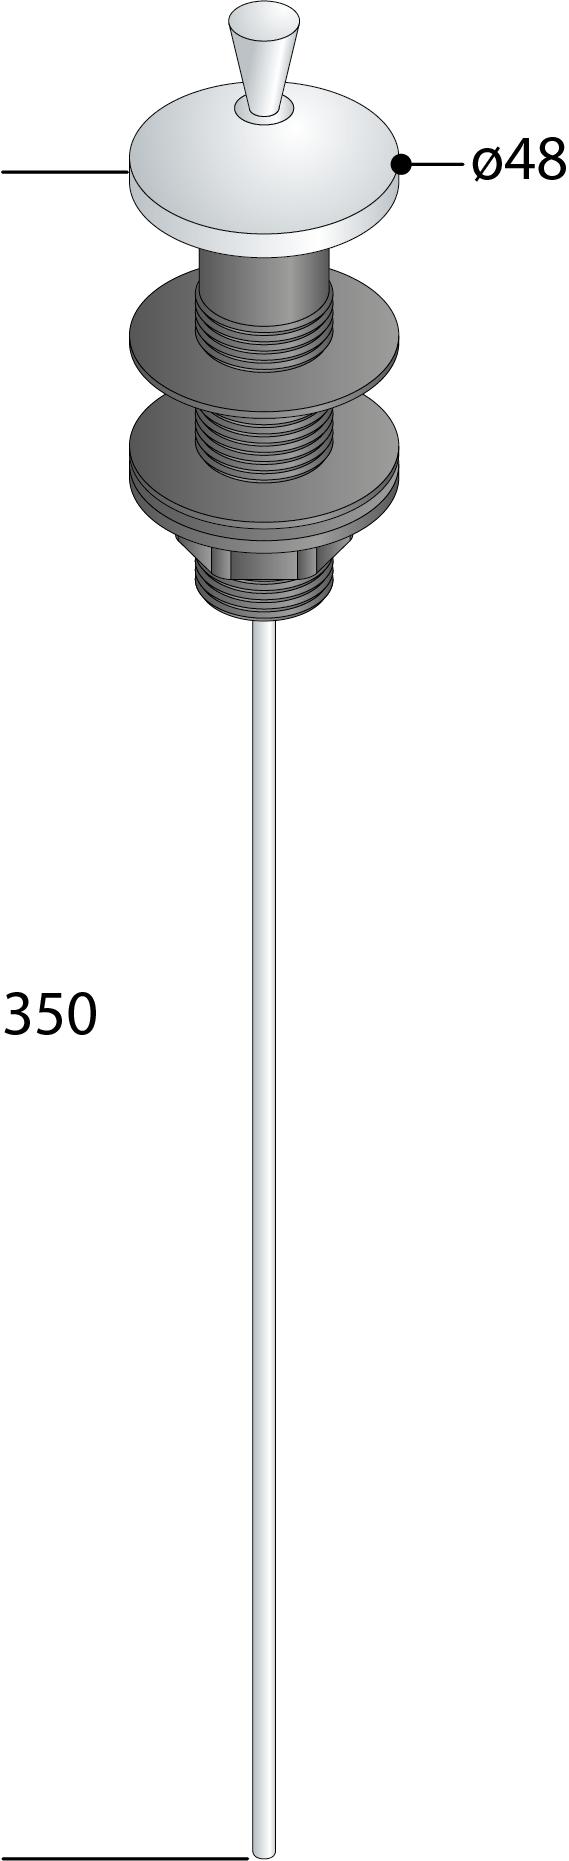 121.099.0